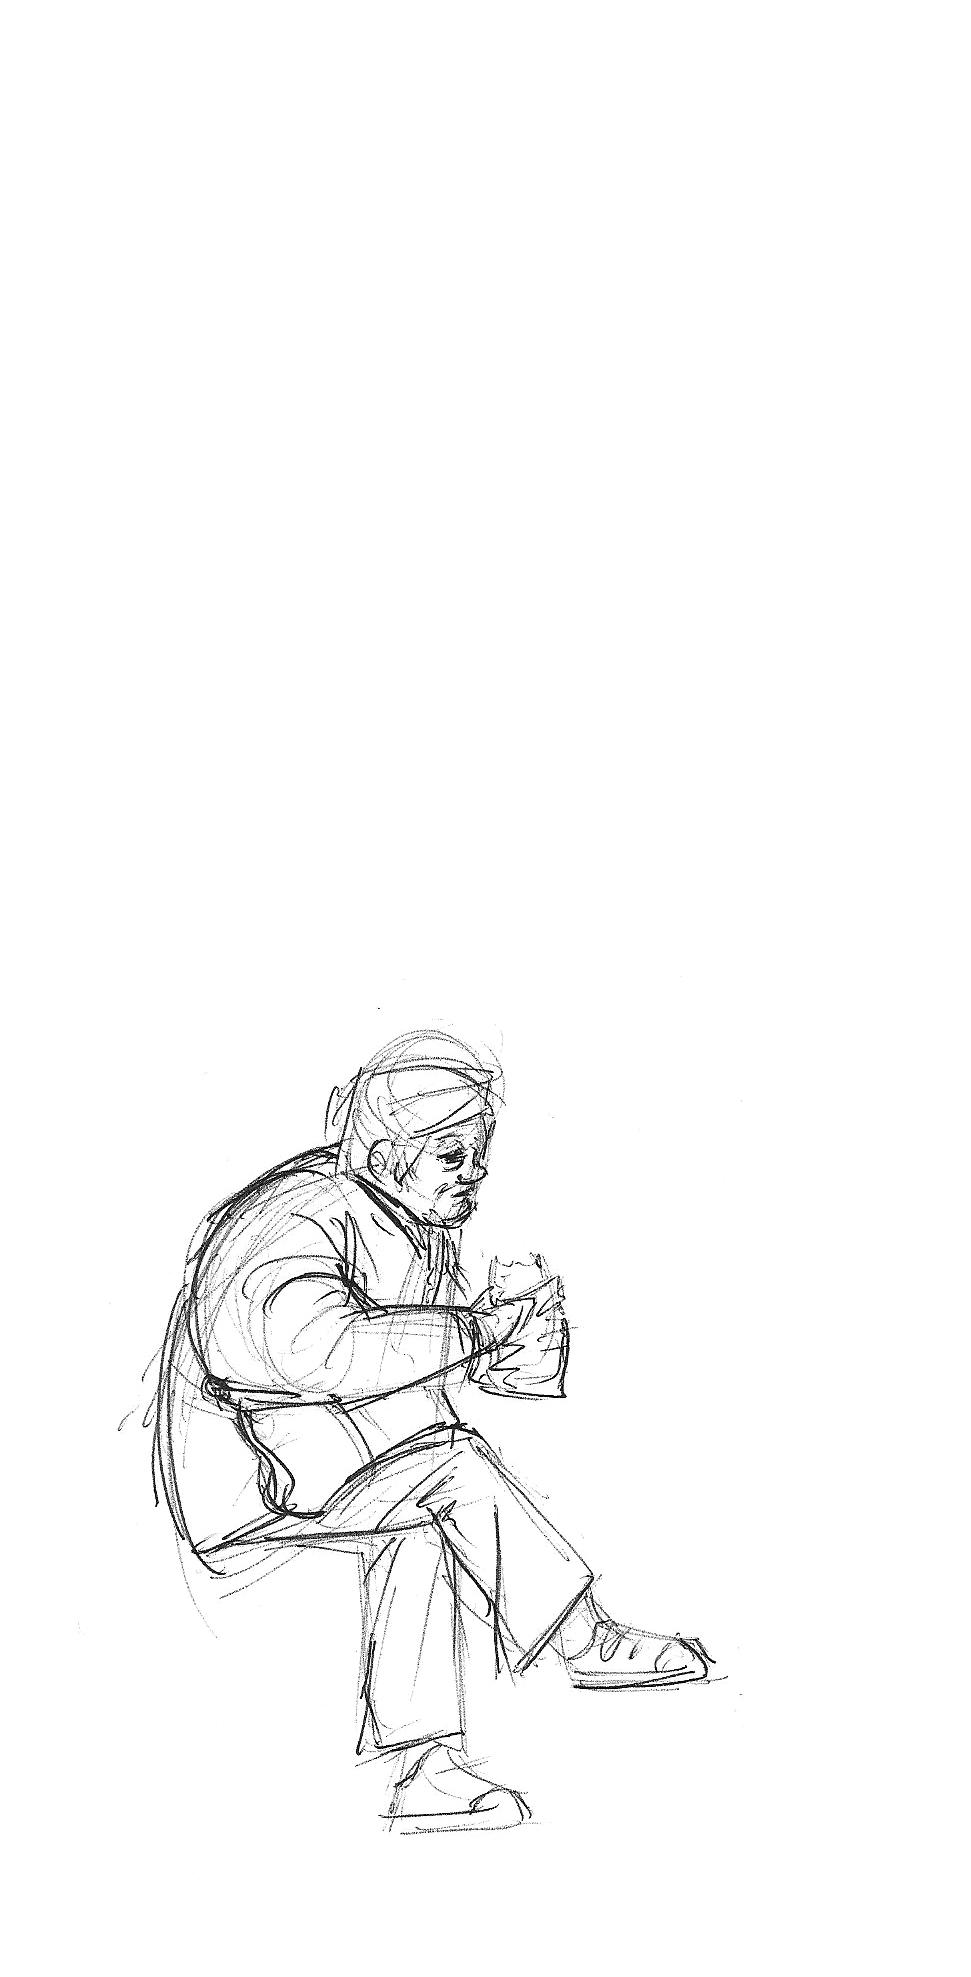 Fa Yuen sketches (1) - 5.jpg